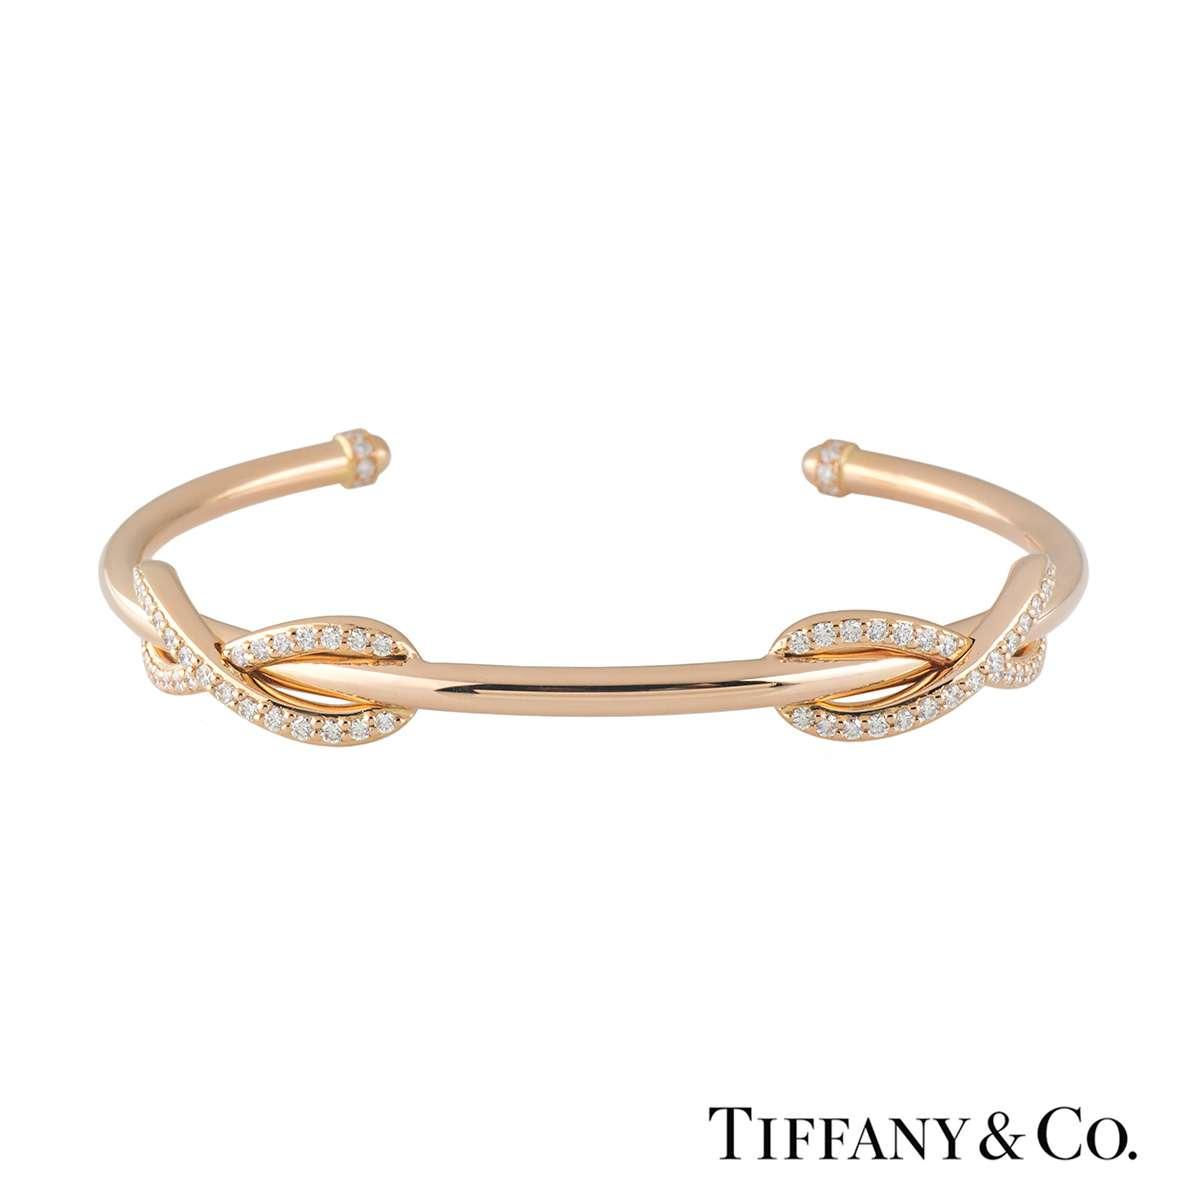 Tiffany & Co. Rose Gold Diamond Double Infinity Cuff Bangle